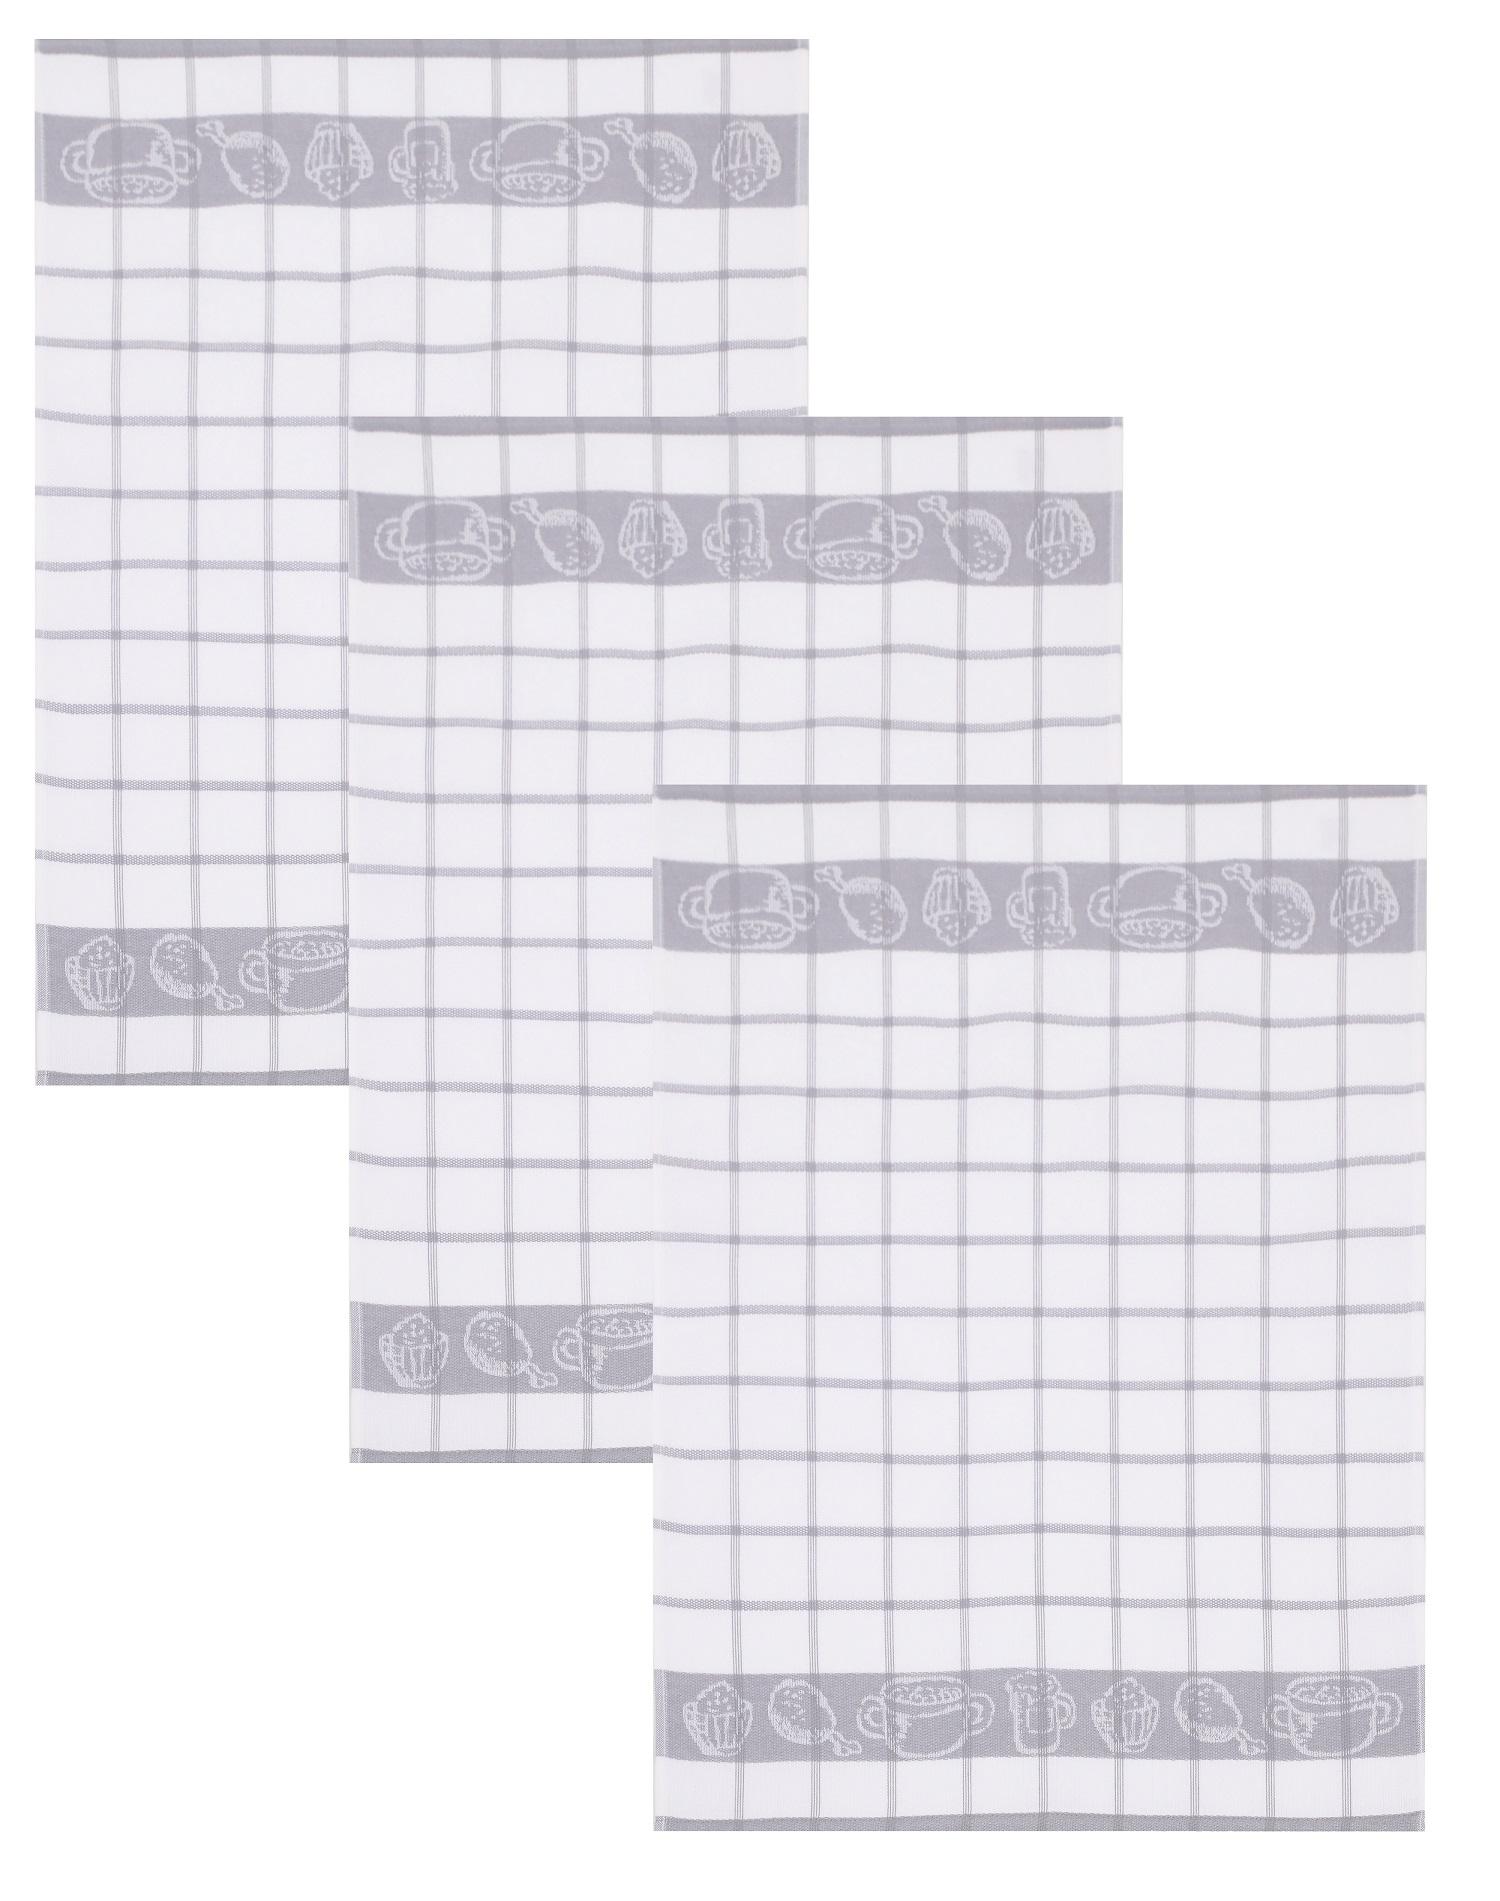 Betz 3 pieces kitchen towel set guten appetit ii kitchen hand towel tea towel terry cloth size 50 x